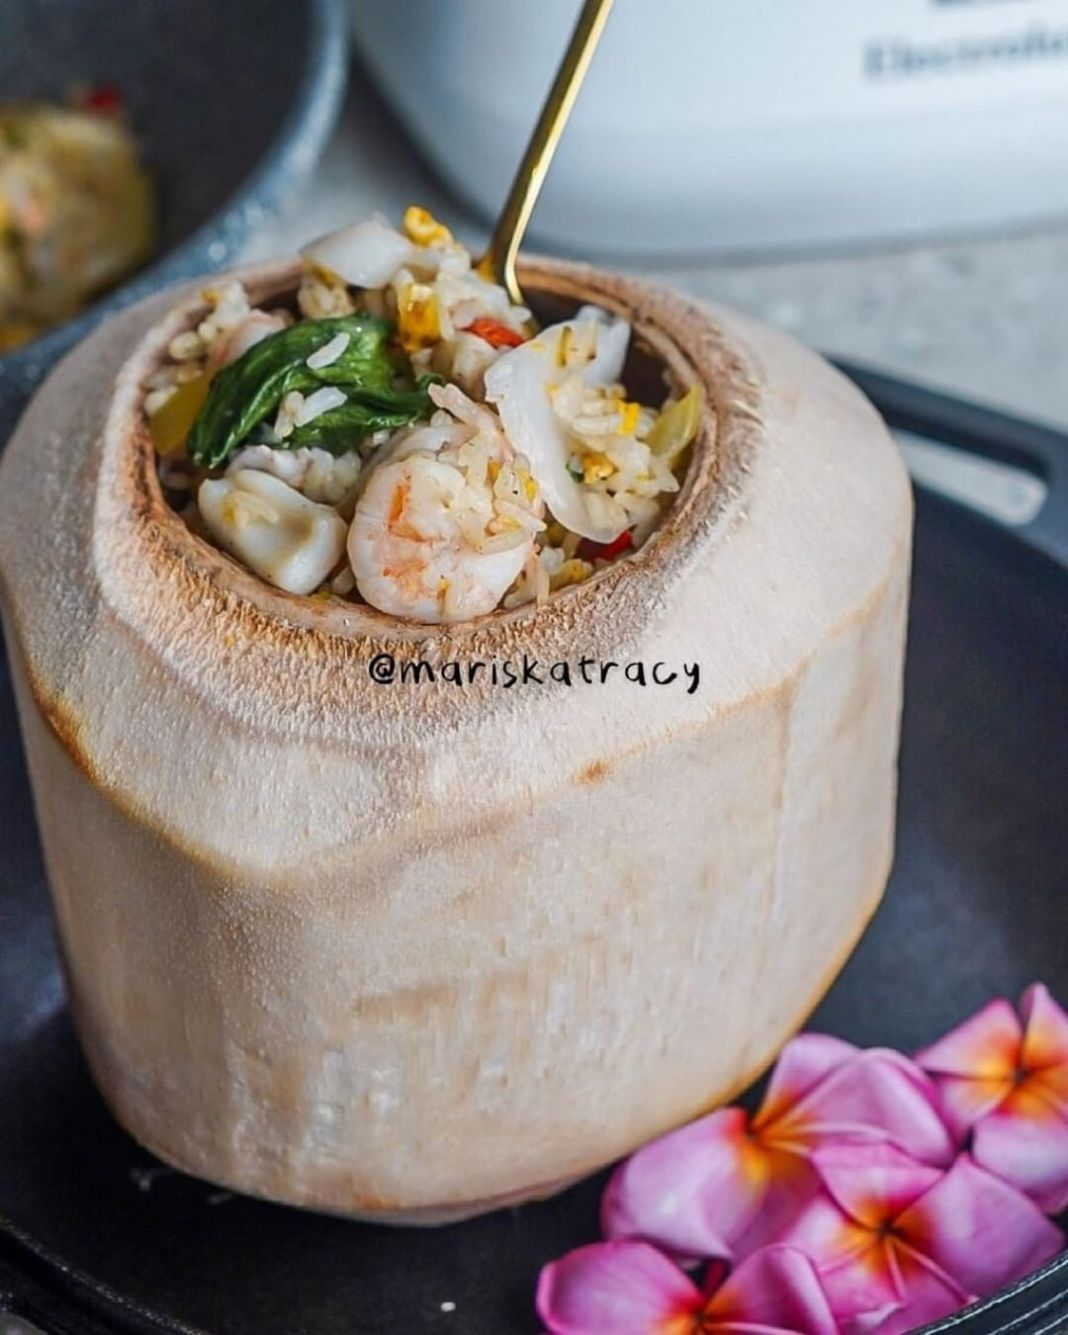 Info kuliner, siapa sih yg bakal nolak sm nasi goreng seafood??? Berikut resepnya. Silahkan direcook!  Nasi G…